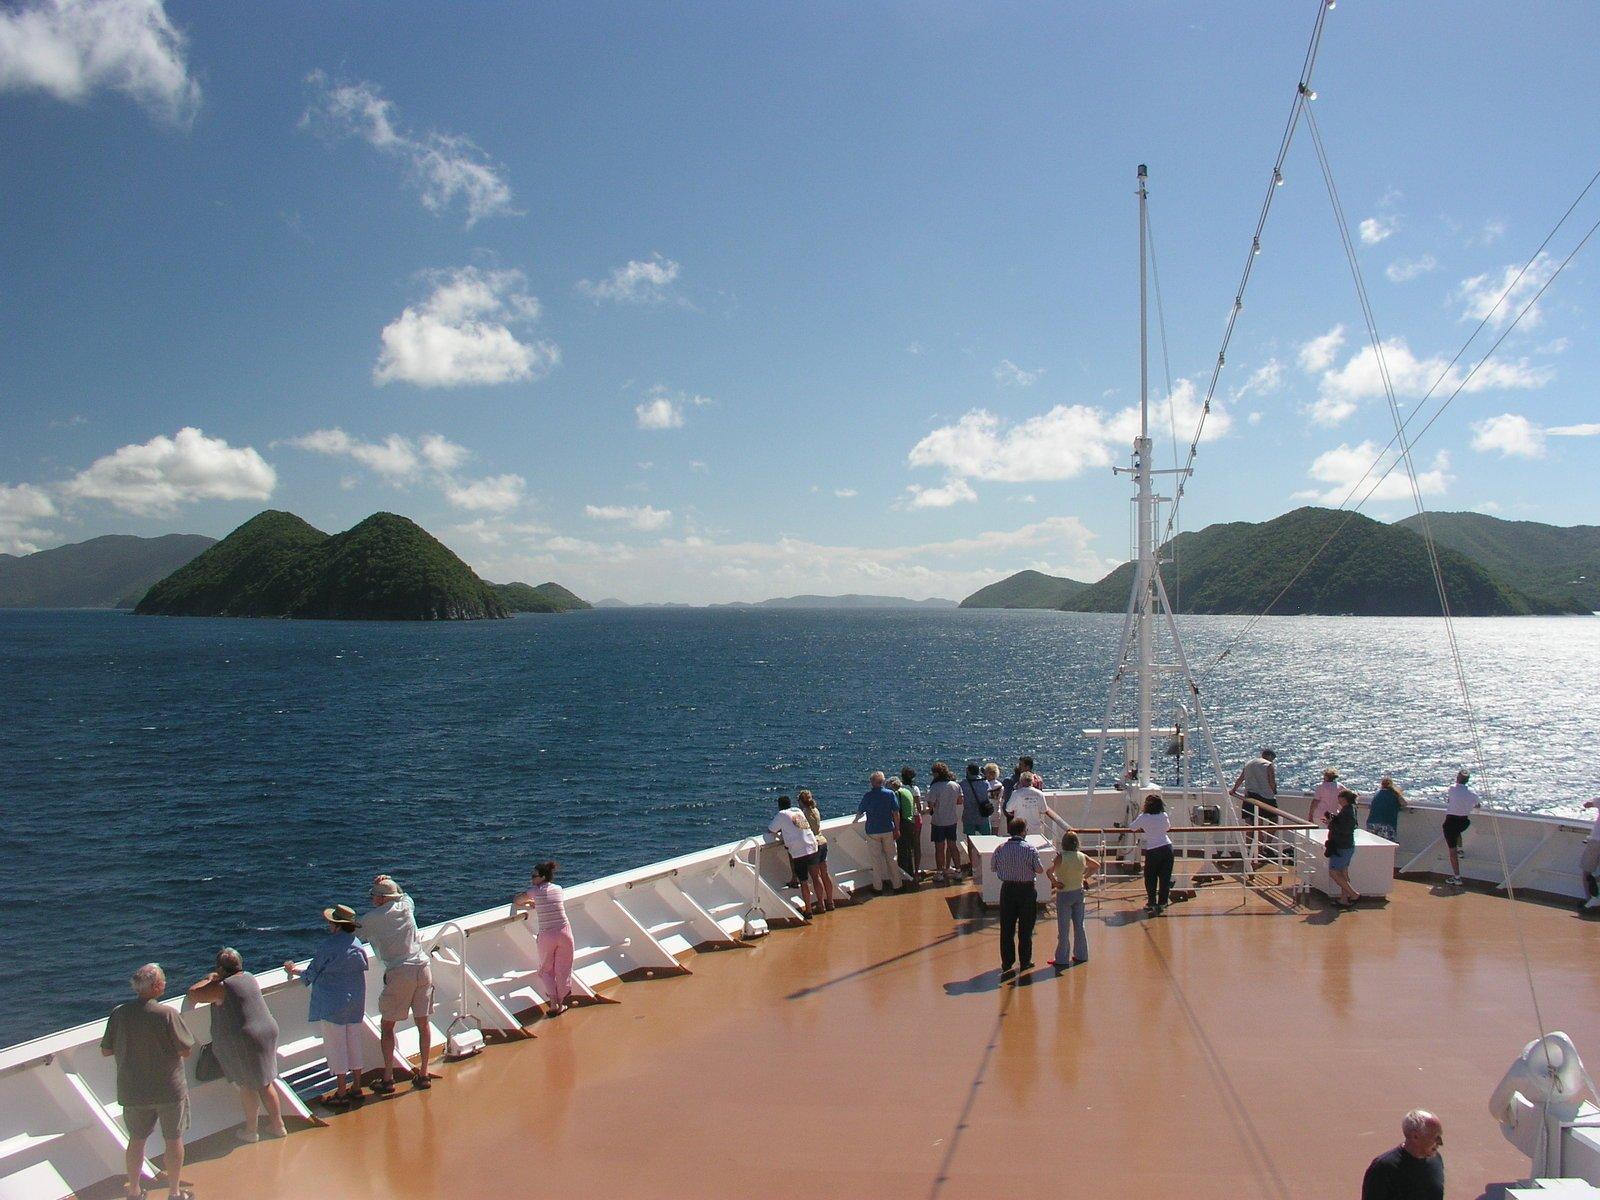 cruising guide to virgin islands jpg 1080x810